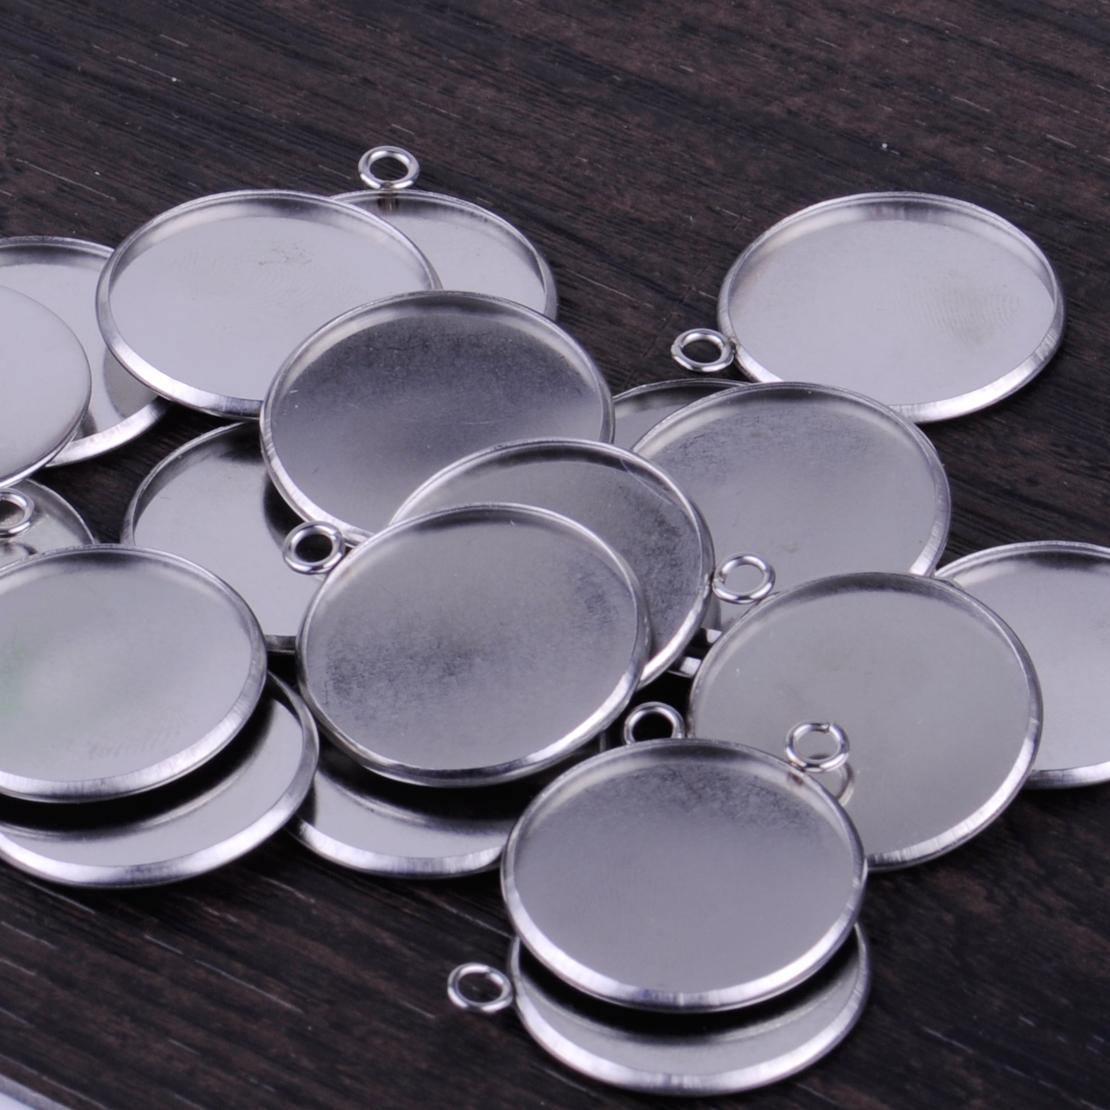 20Pcs Round Bezel Pendant Trays Blank Bases 25mm Cabochon Settings DIY Craft